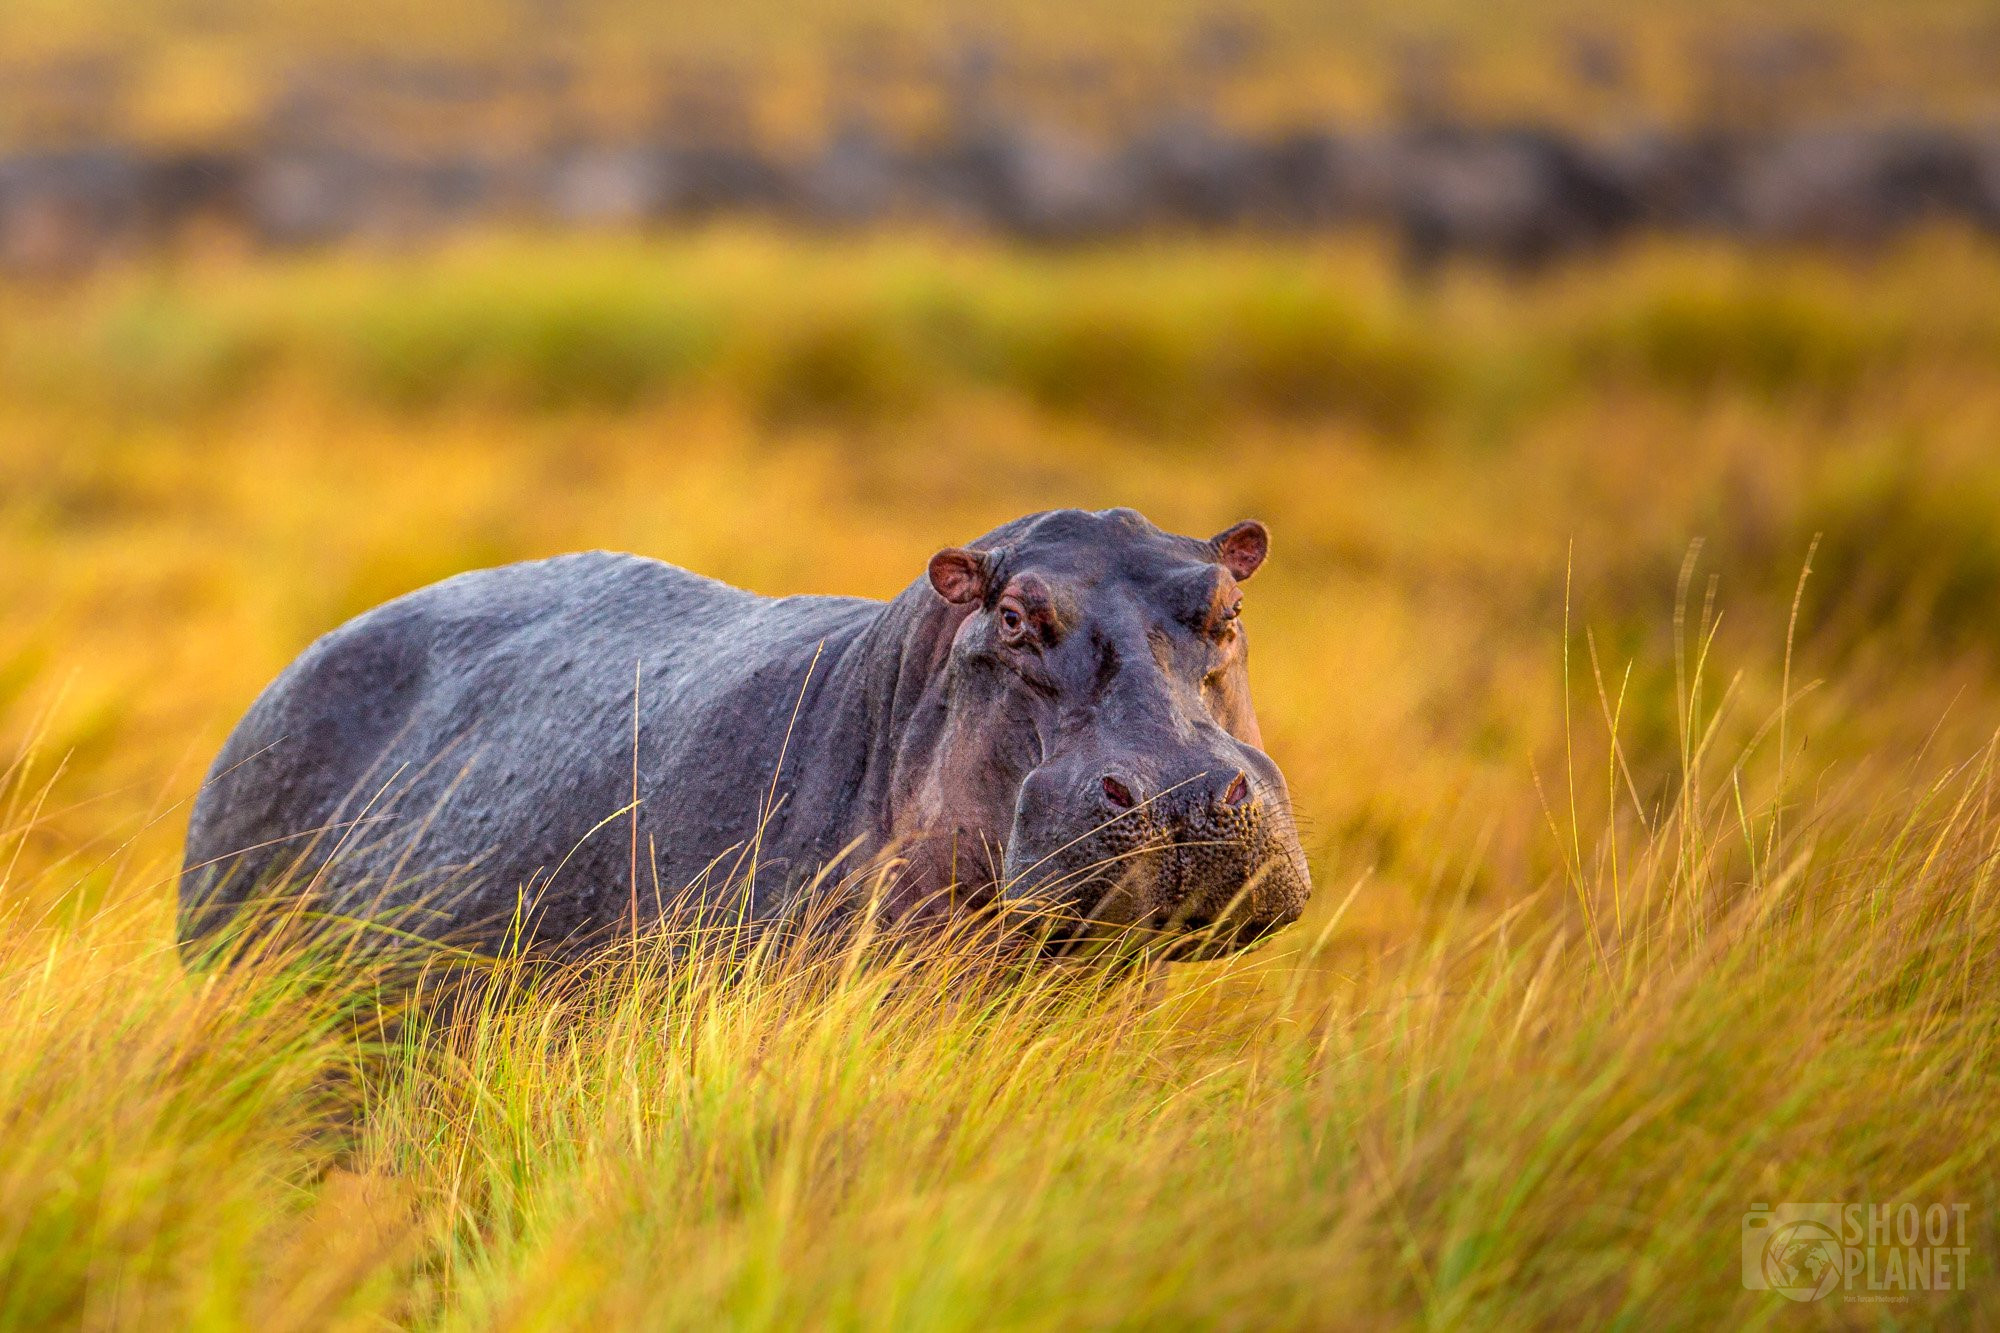 Hippopotamus in Serengeti national park savanna, Tanzania